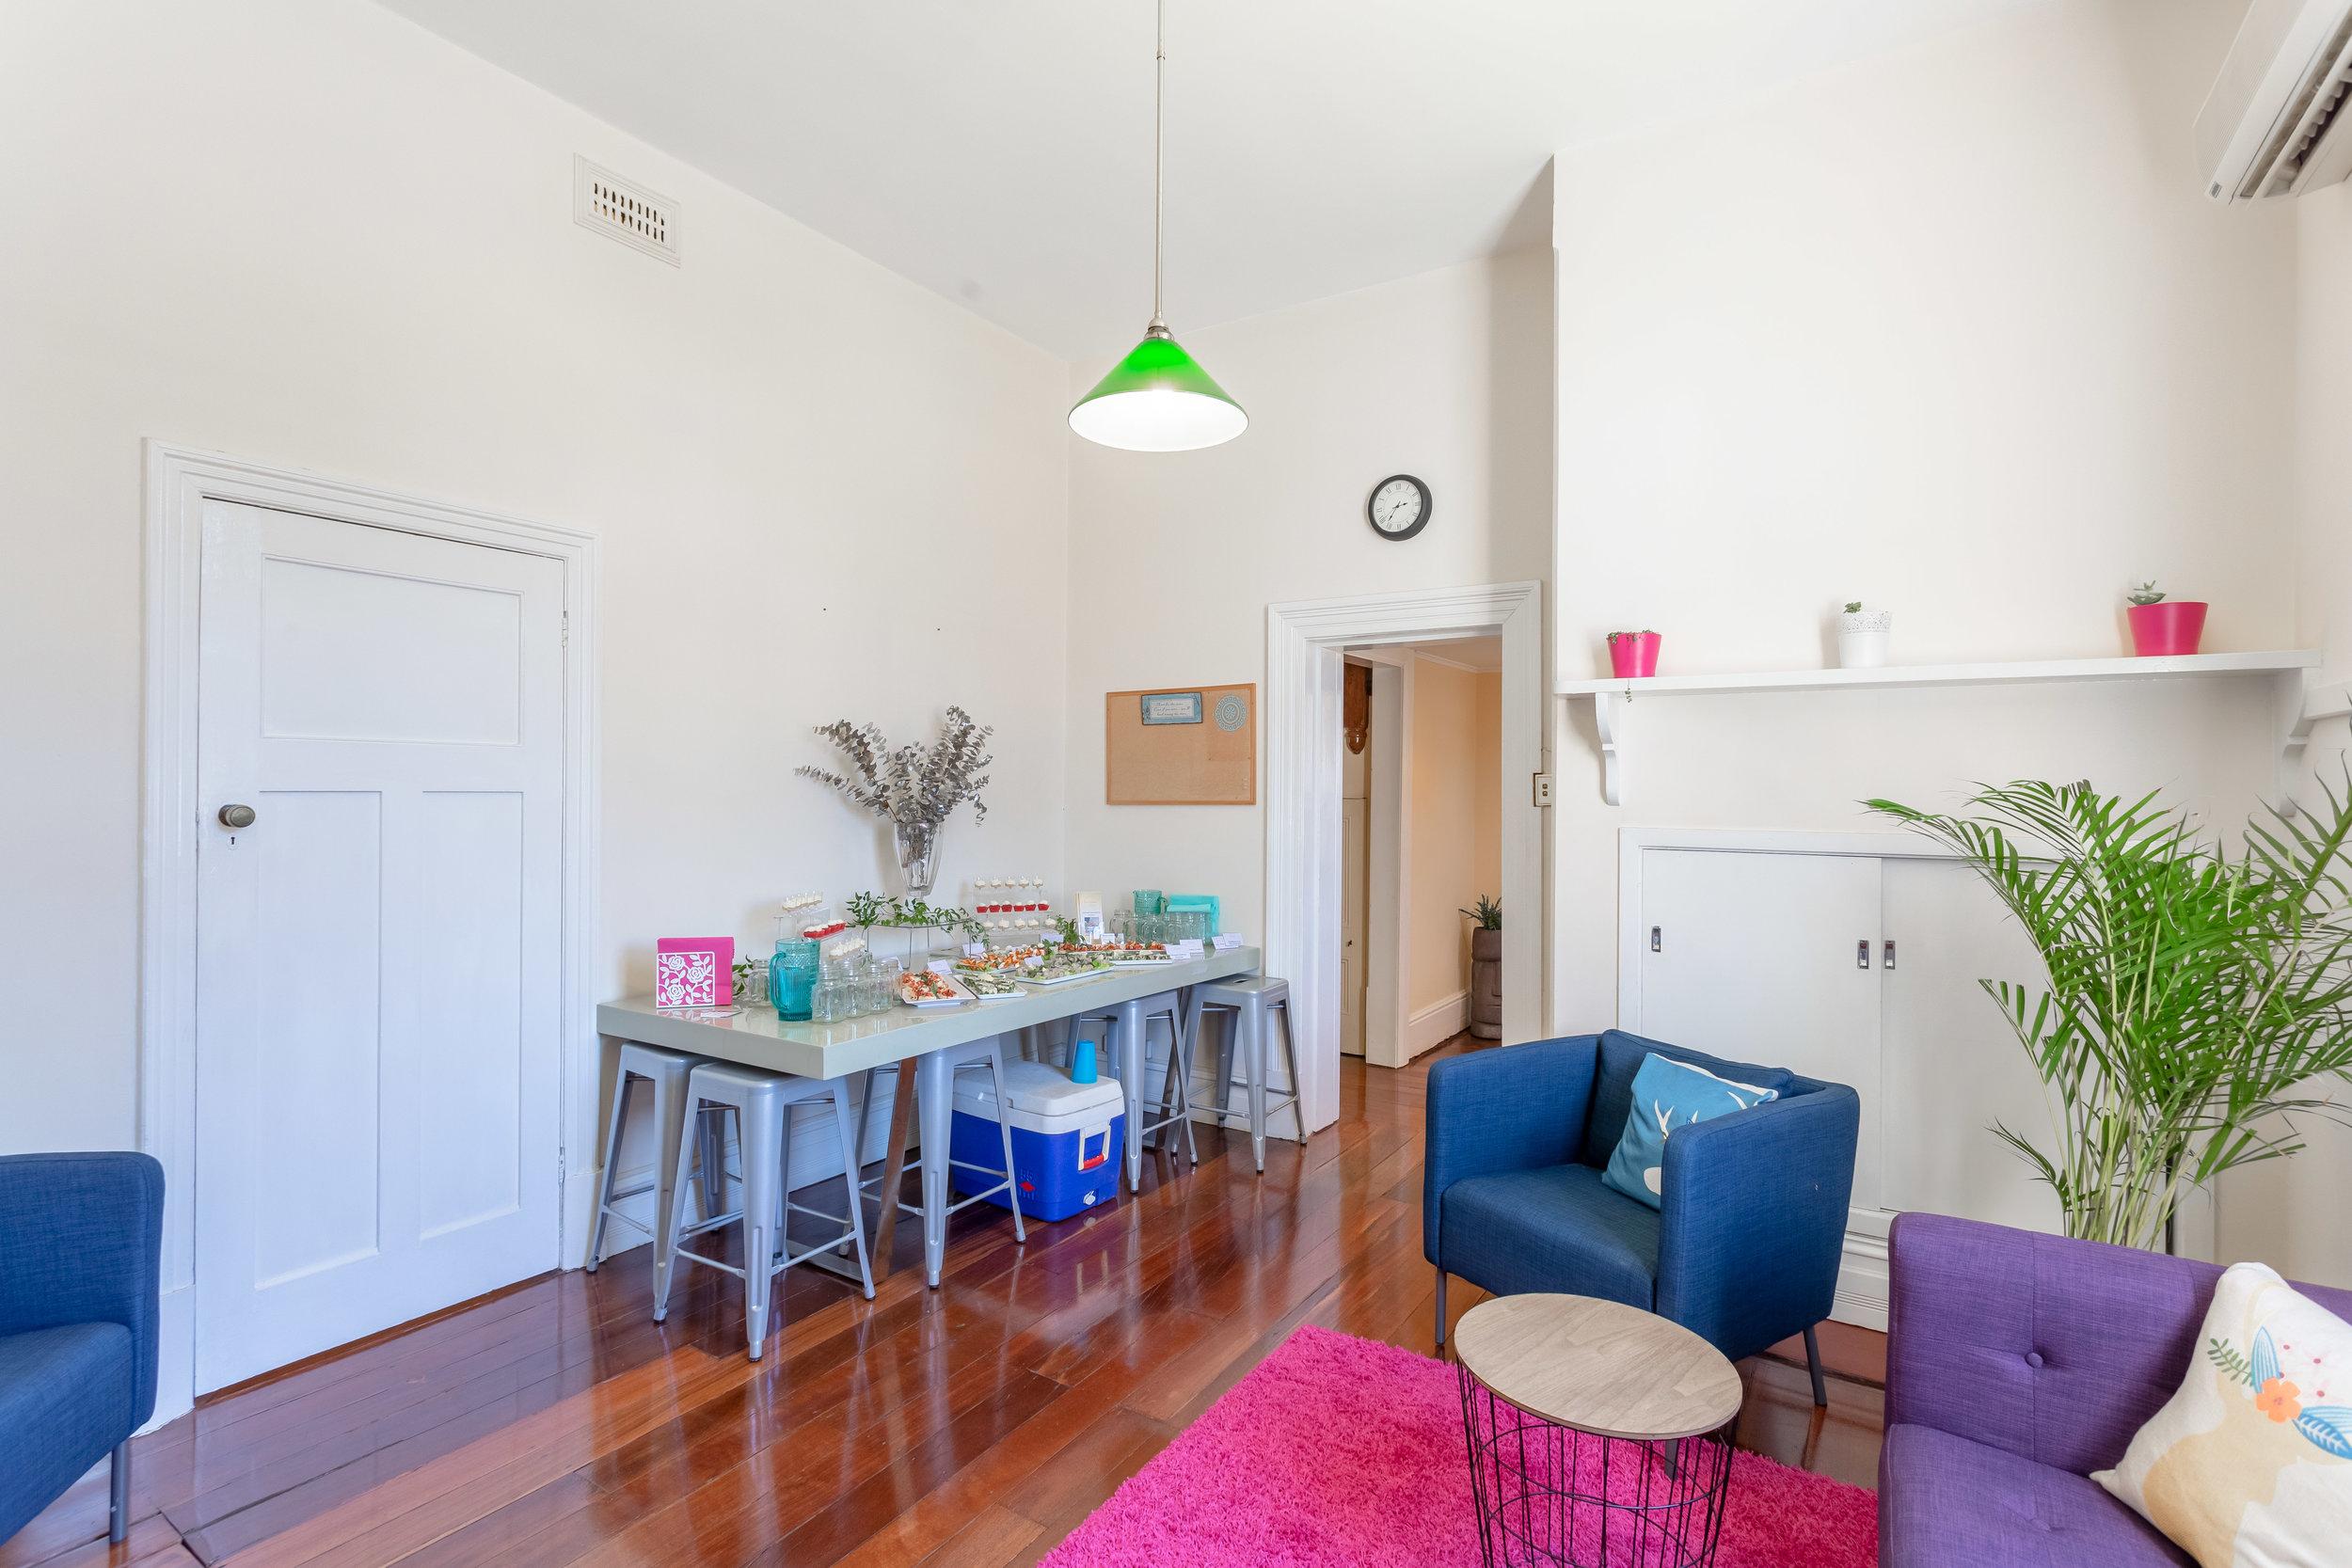 Members' dining/lounge area